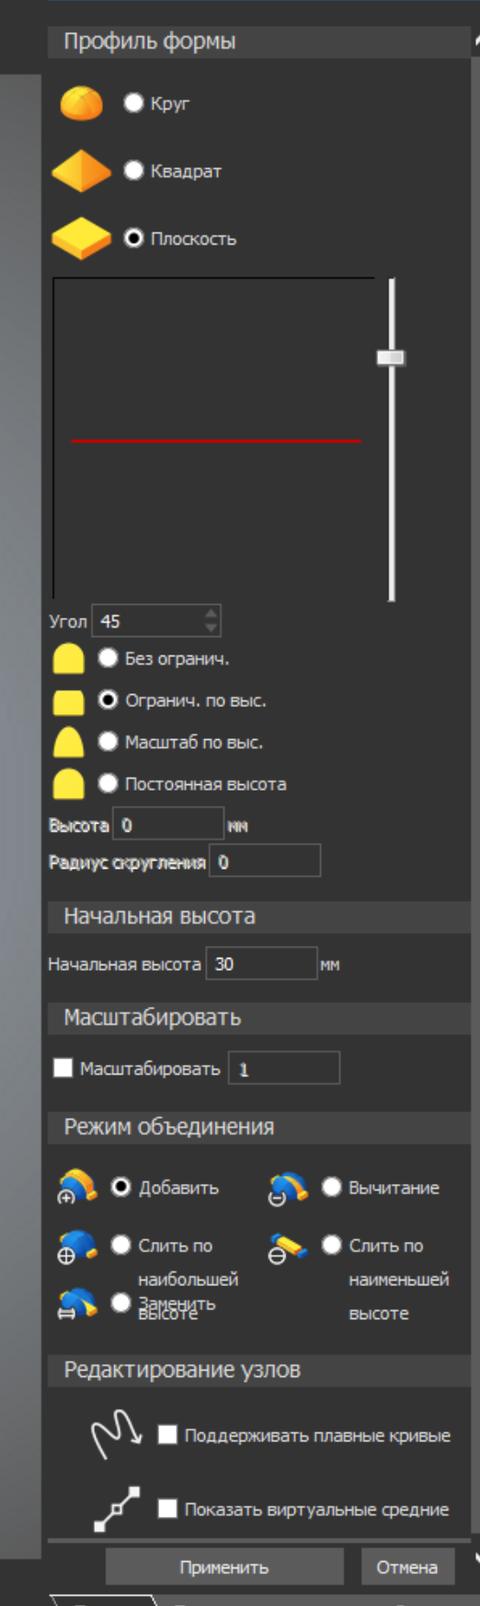 http://s5.uploads.ru/t/AxaKU.png